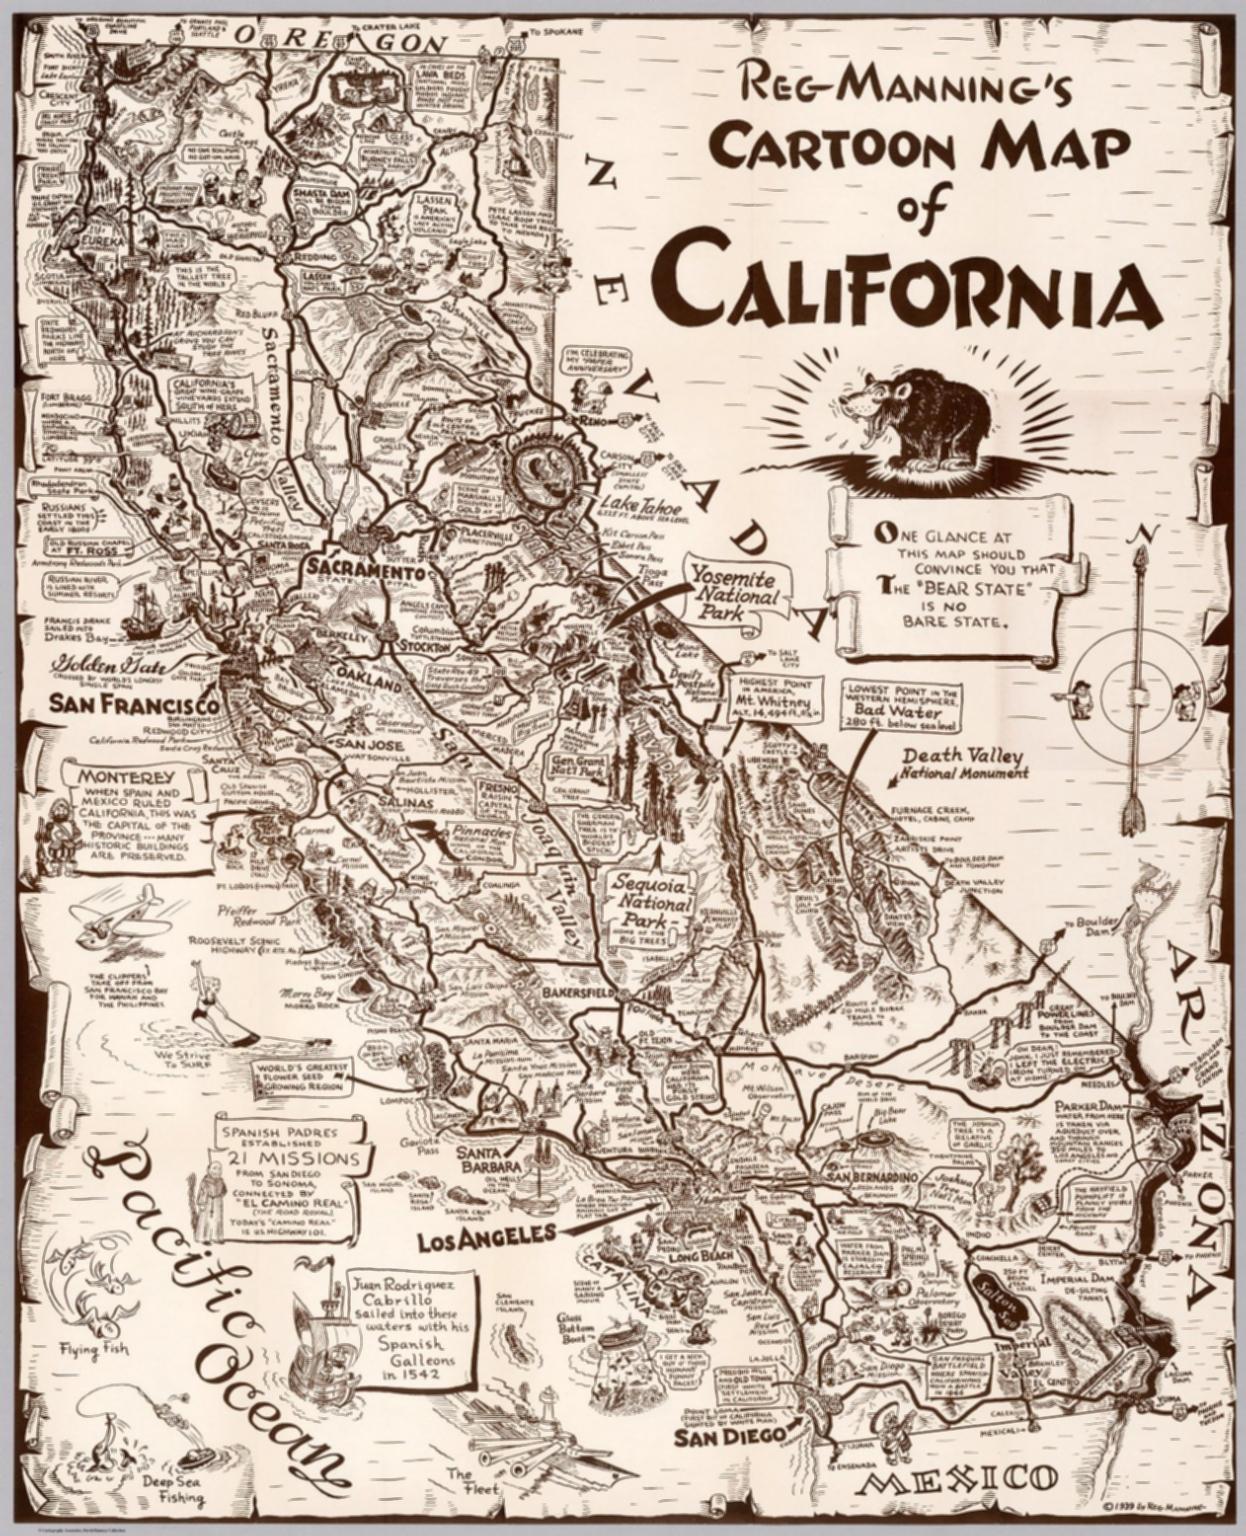 California Map Cartoon.Separate Map Reg Manning S Cartoon Map Of California David